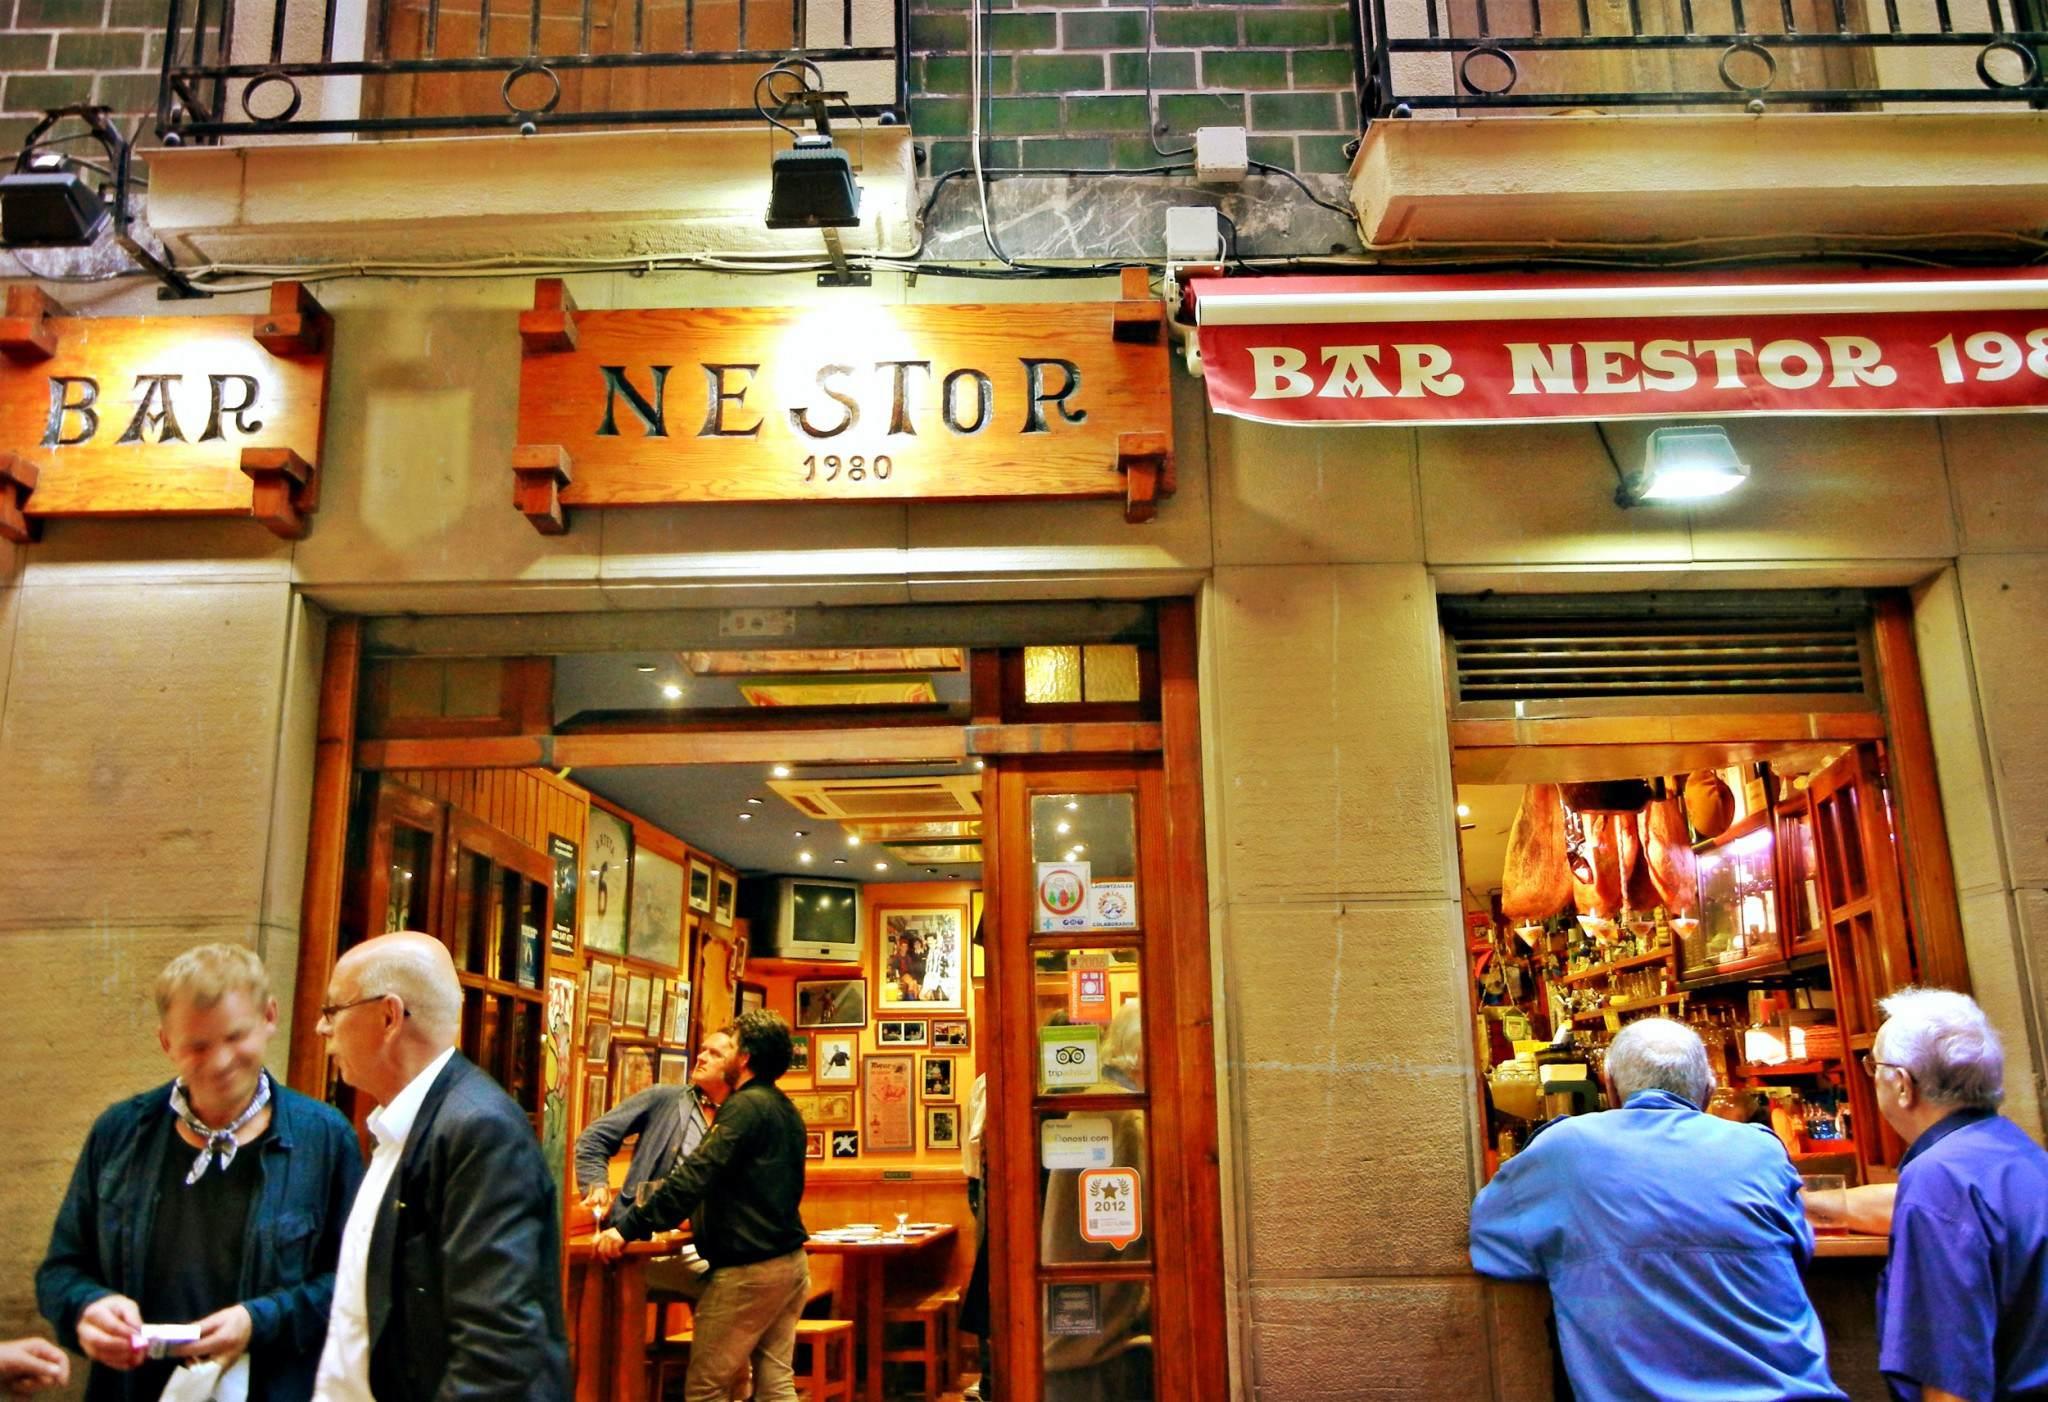 bar nestor entrada